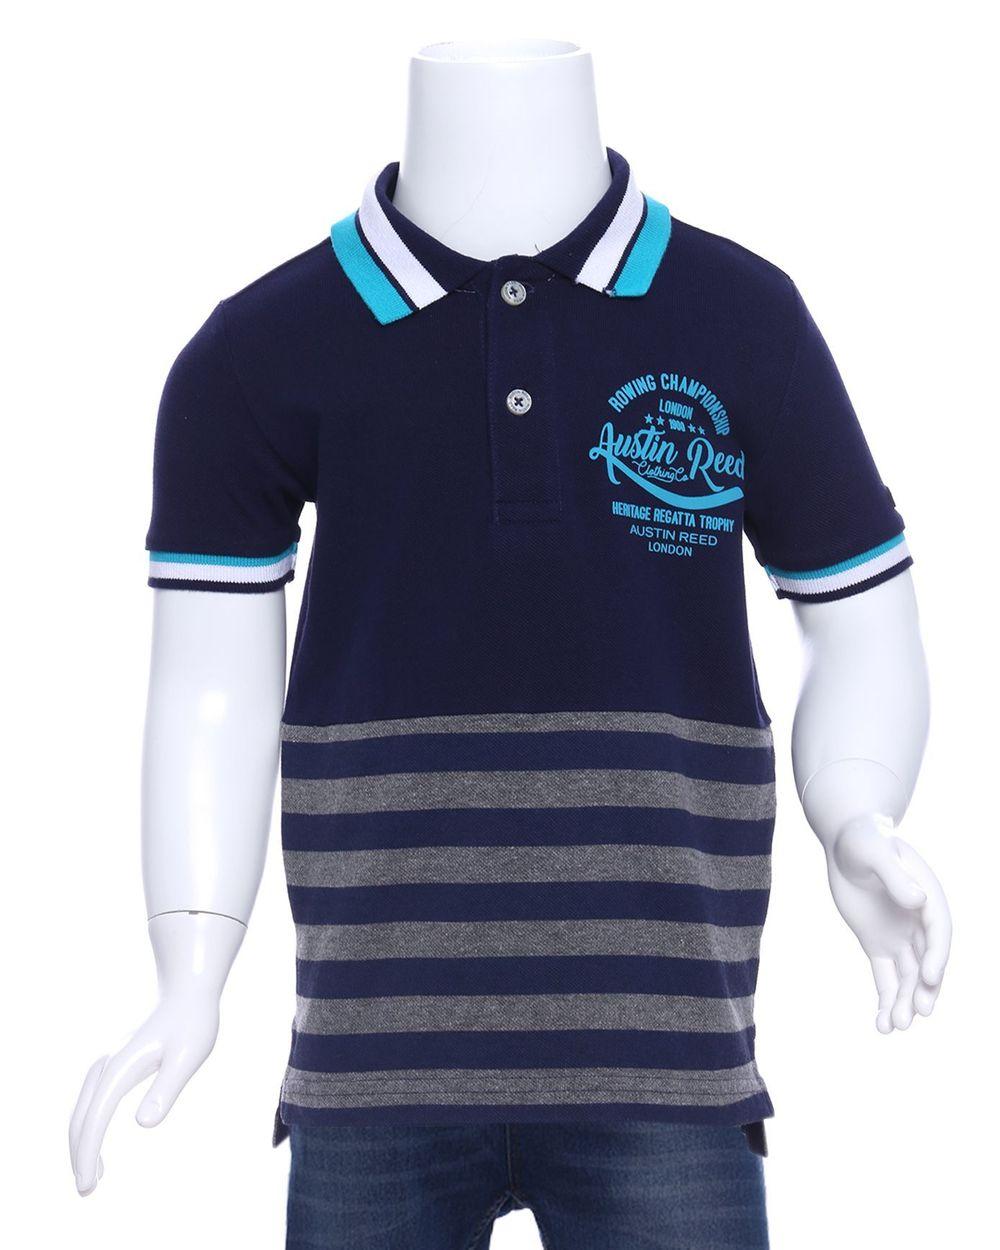 Austin Reed Regatta Boys Black Striped Polo T Shirt 3 4 Years Buy Clothing Online Best Price And Offers Ksa Hnak Com